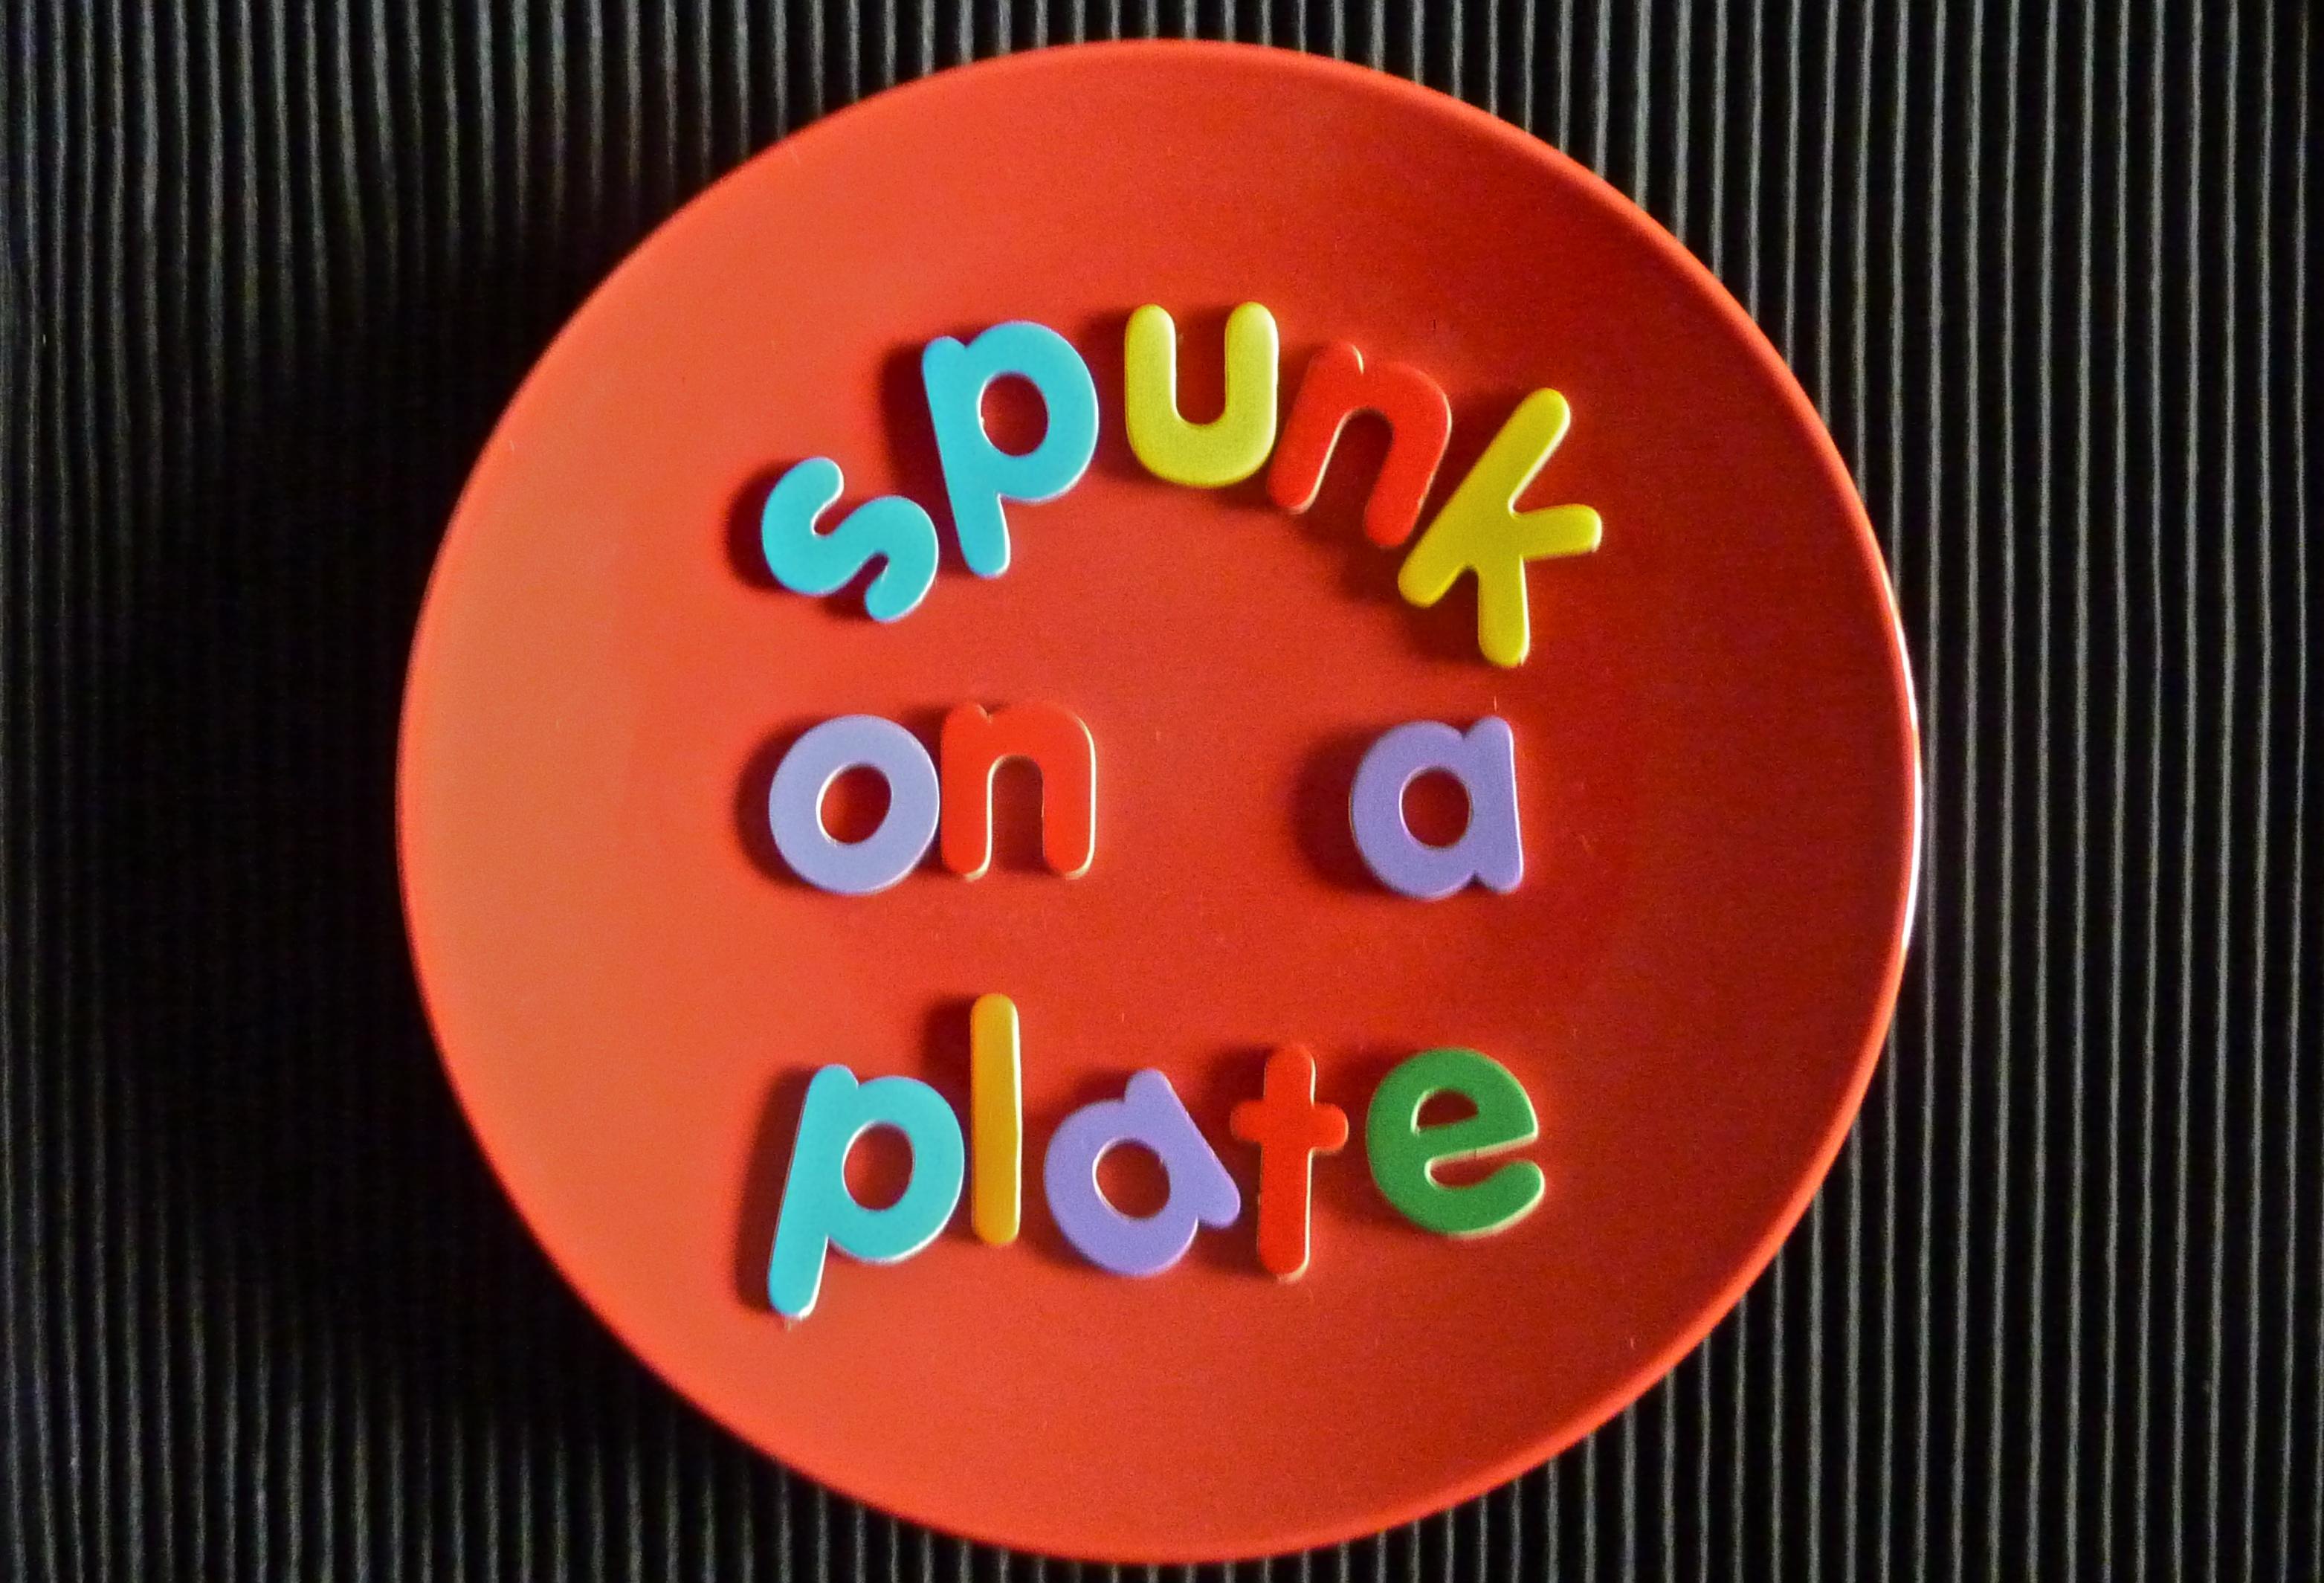 Spunk in food